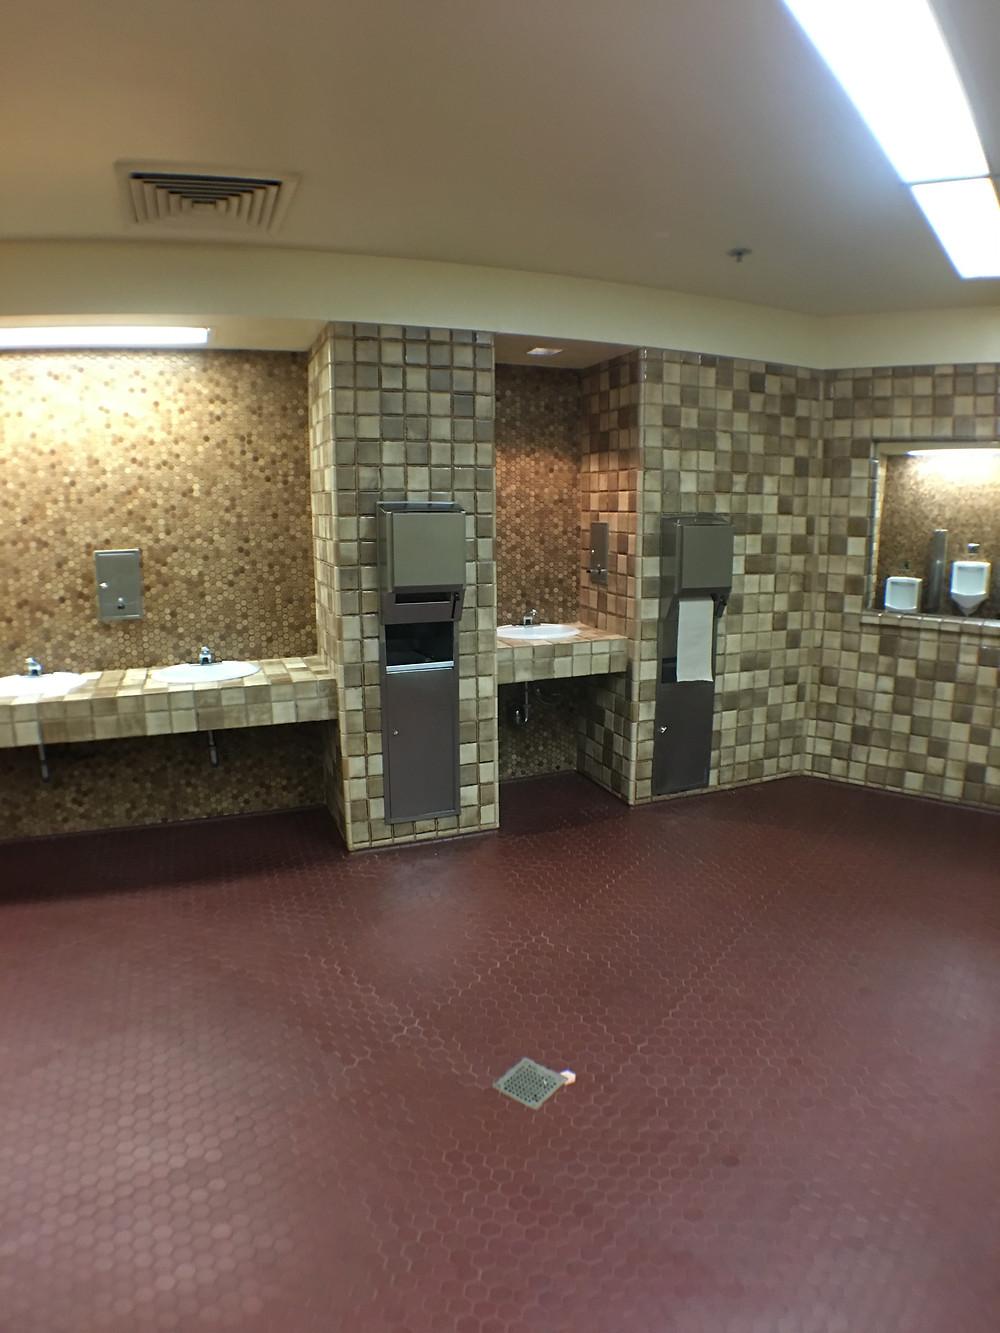 Sinks-a-Plenty Epcot Men's Room Odyssey Center